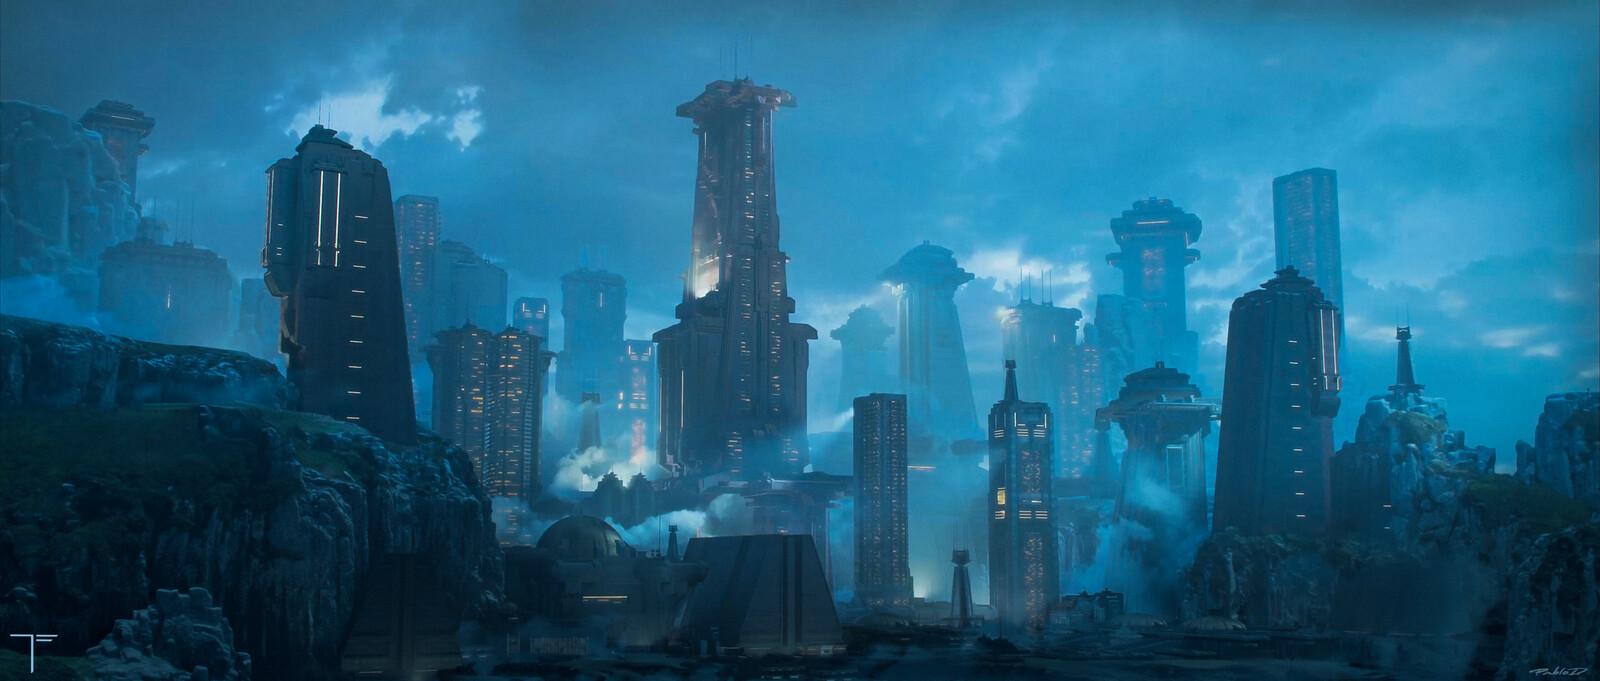 Scifi Buildings  cover for Terraform Studios.